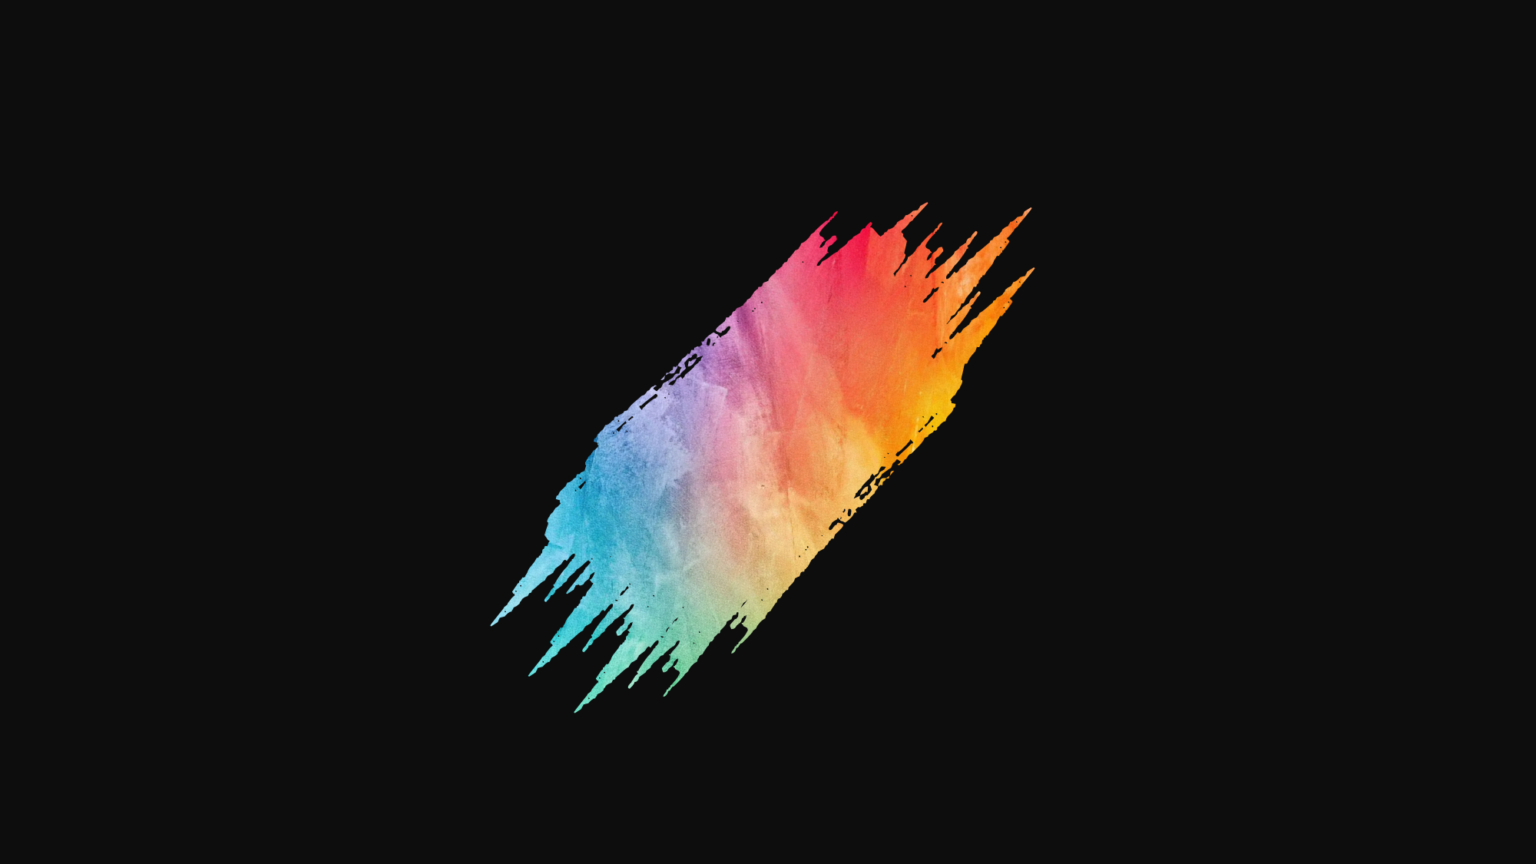 [PowerPoint Tutorial] যেকোনো ছবিতে Brush Paint Effect যোগ করুন খুব সহজে